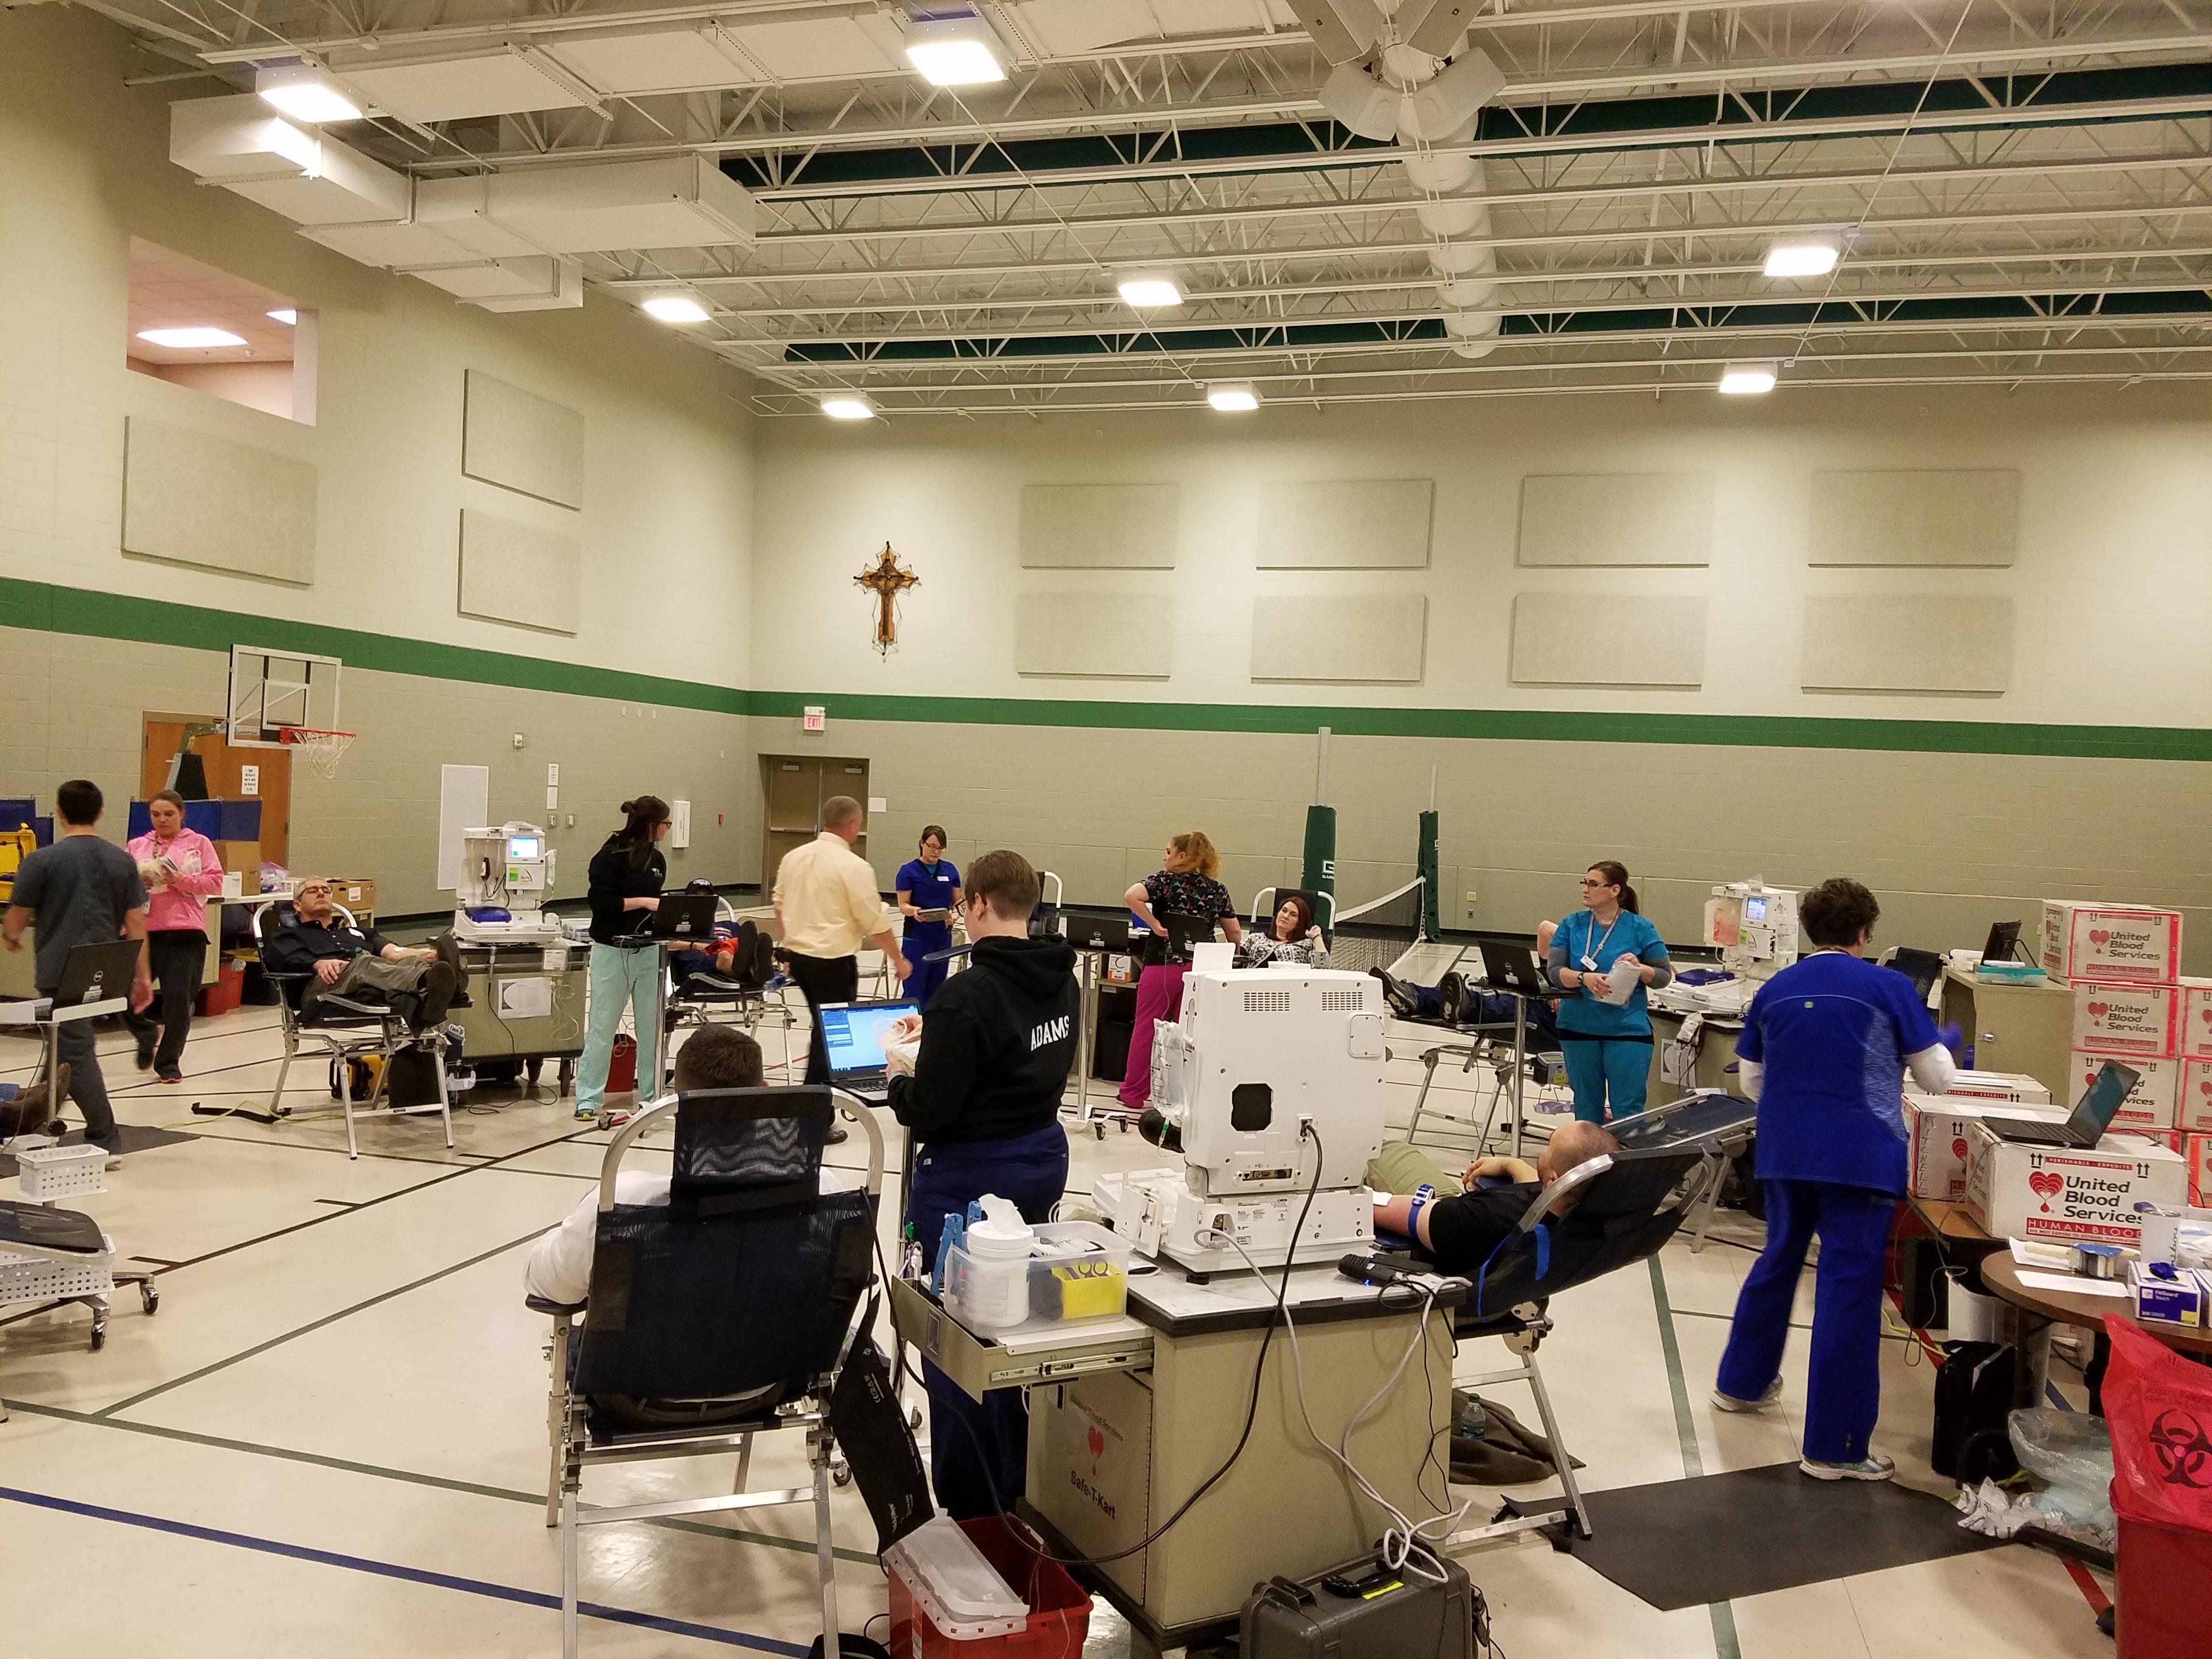 Vitalant Loosening Blood Donation Protocols For Covid